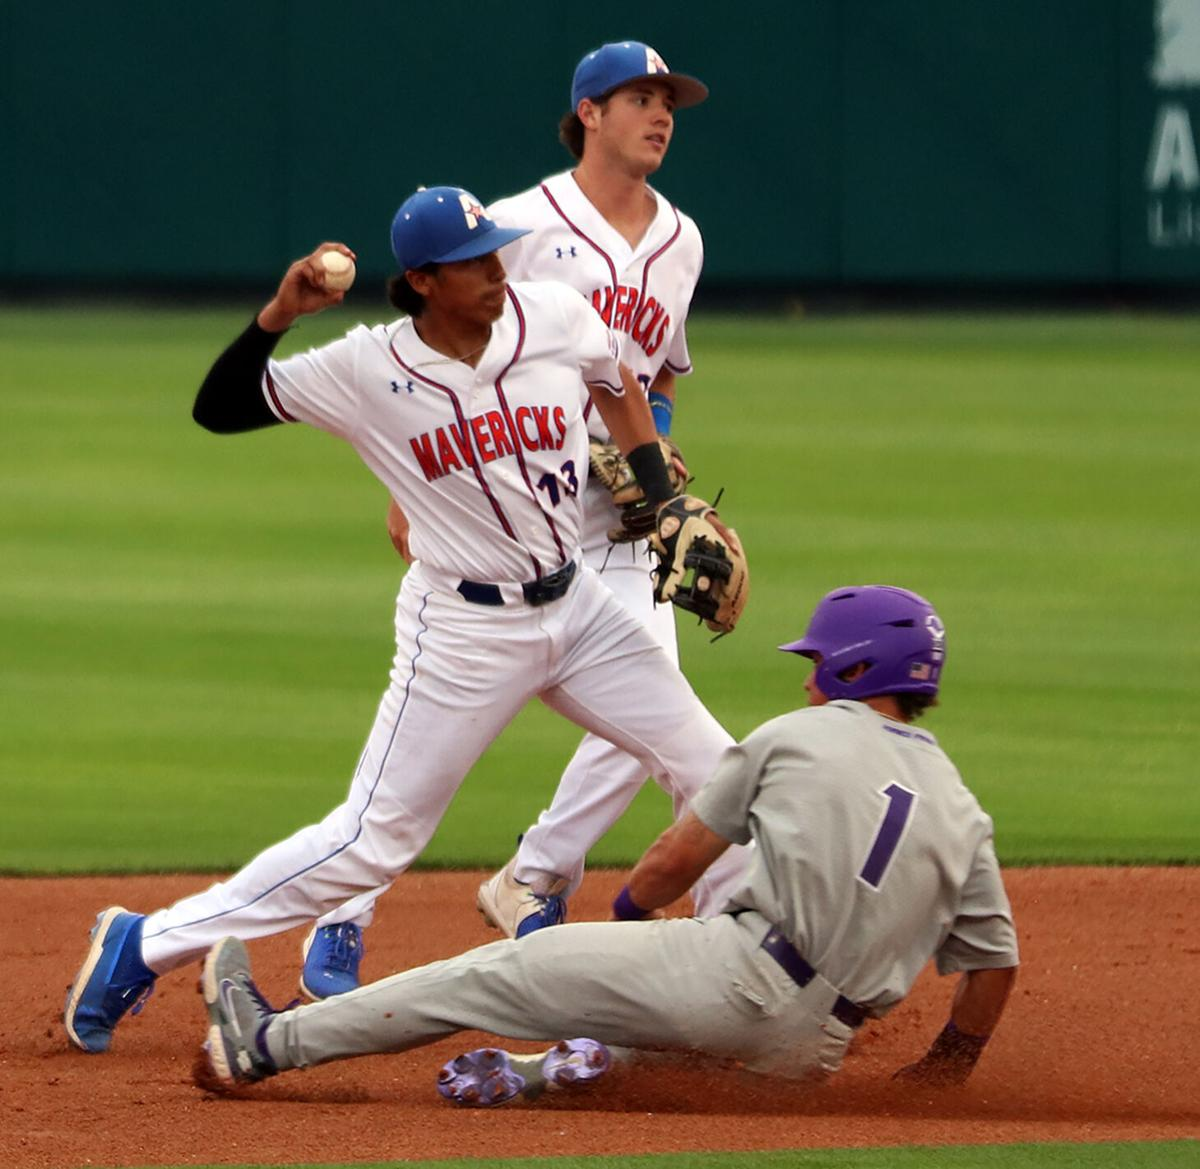 UTA baseball flounders in 8-3 loss to TCU